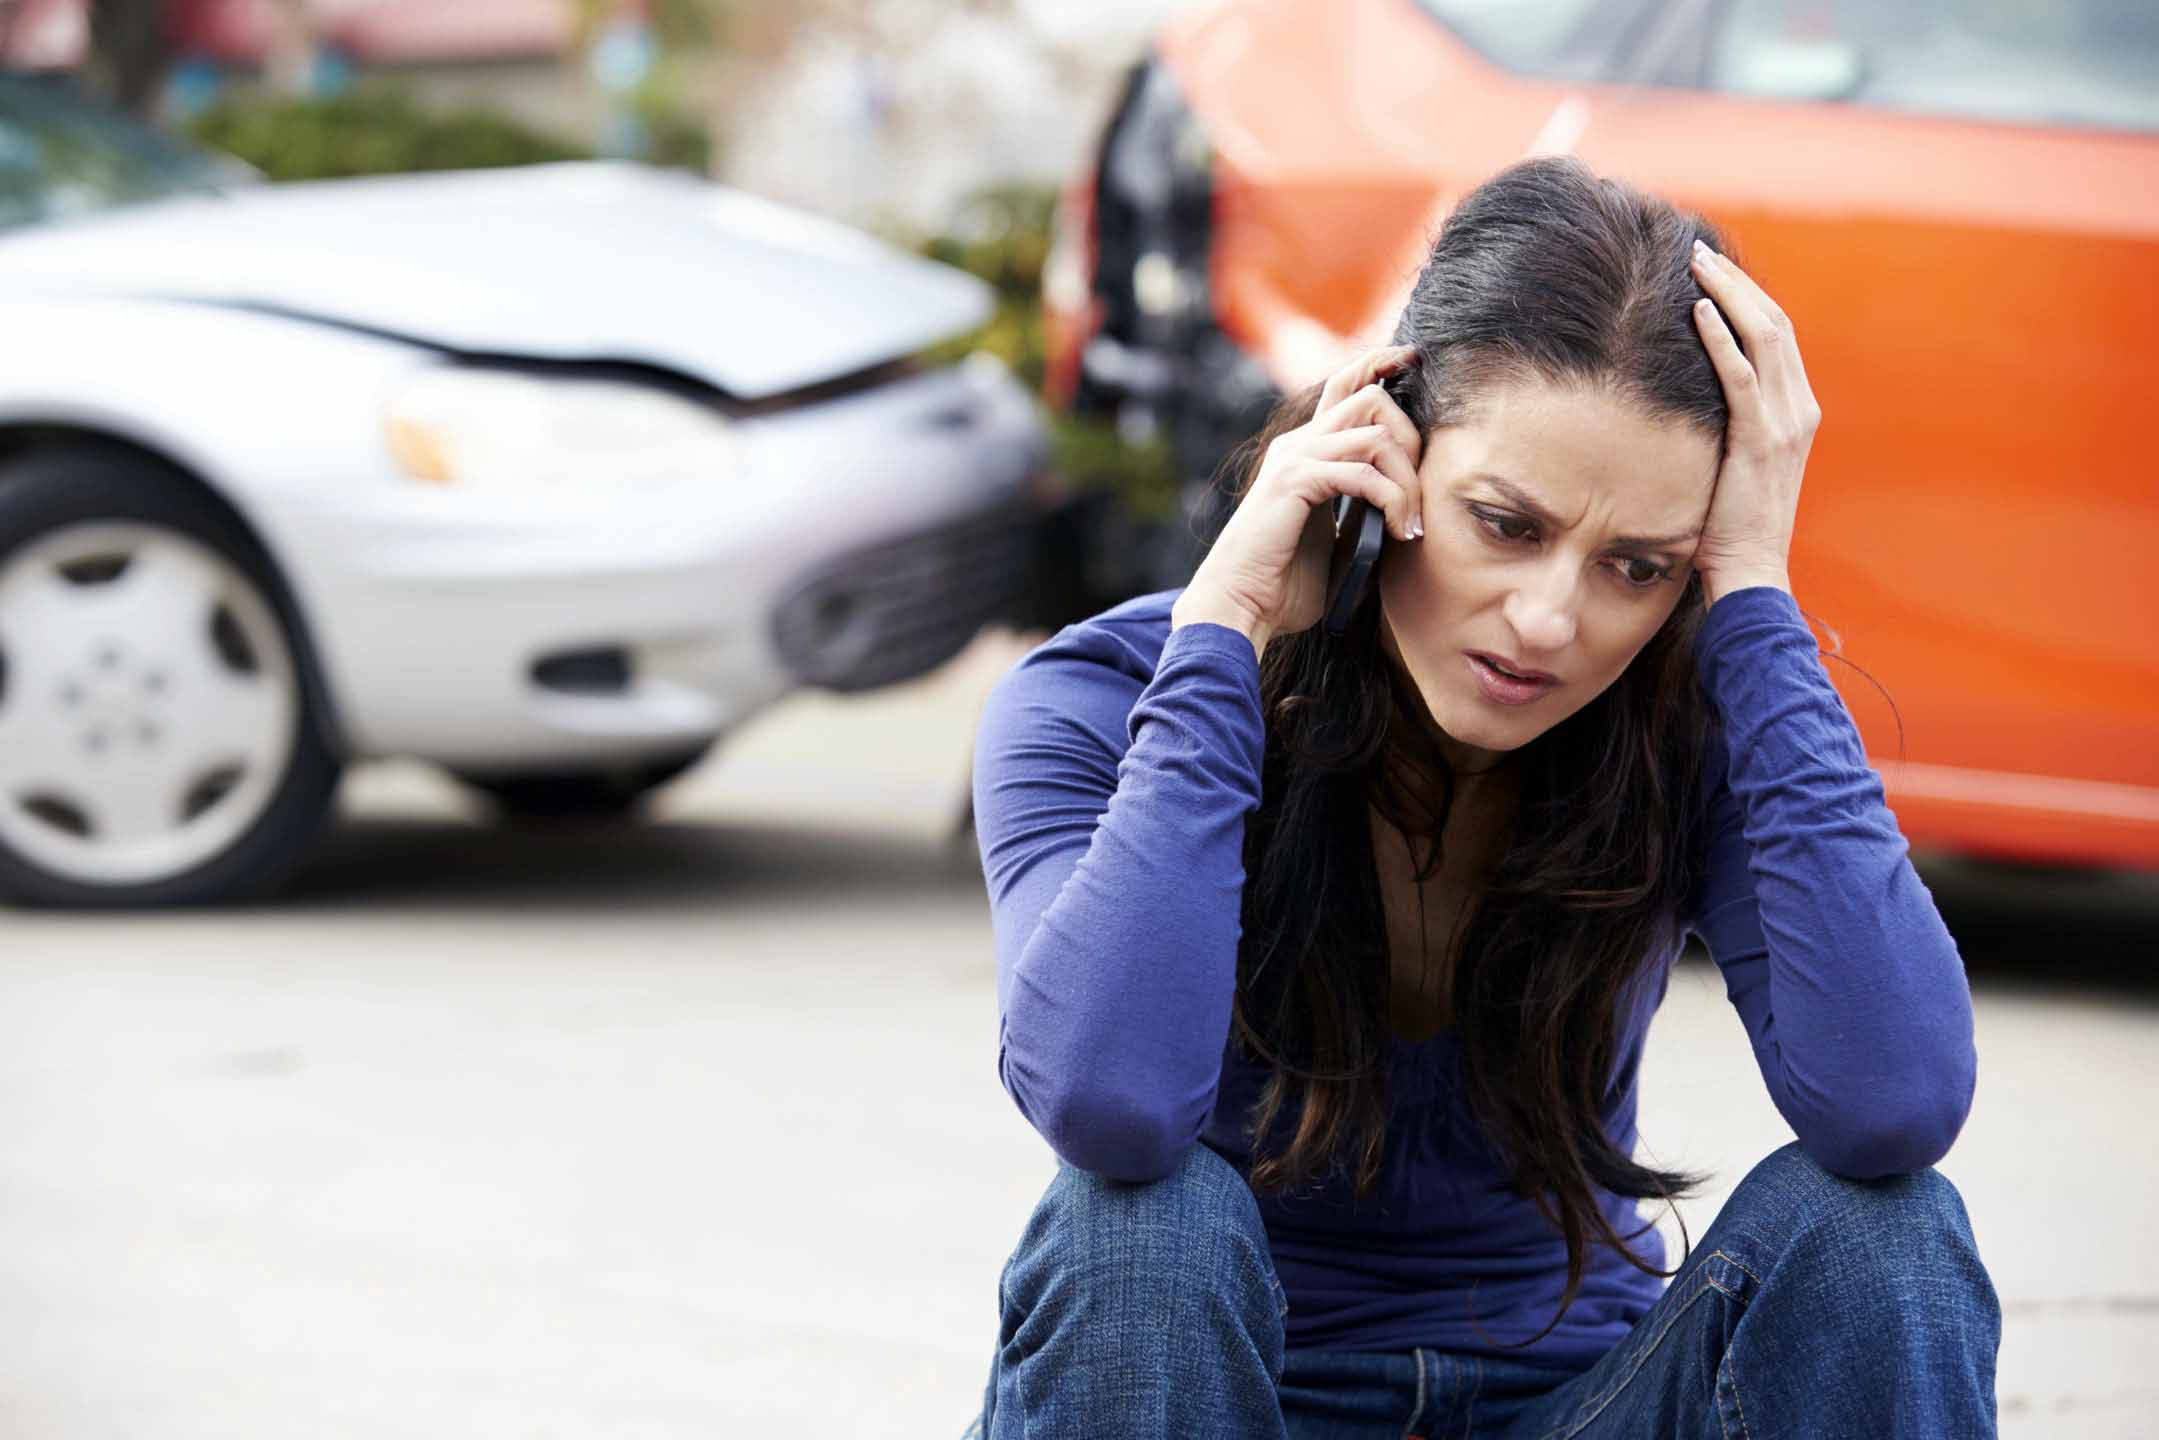 Personal Injury Accident Law Firm El Segundo, CA